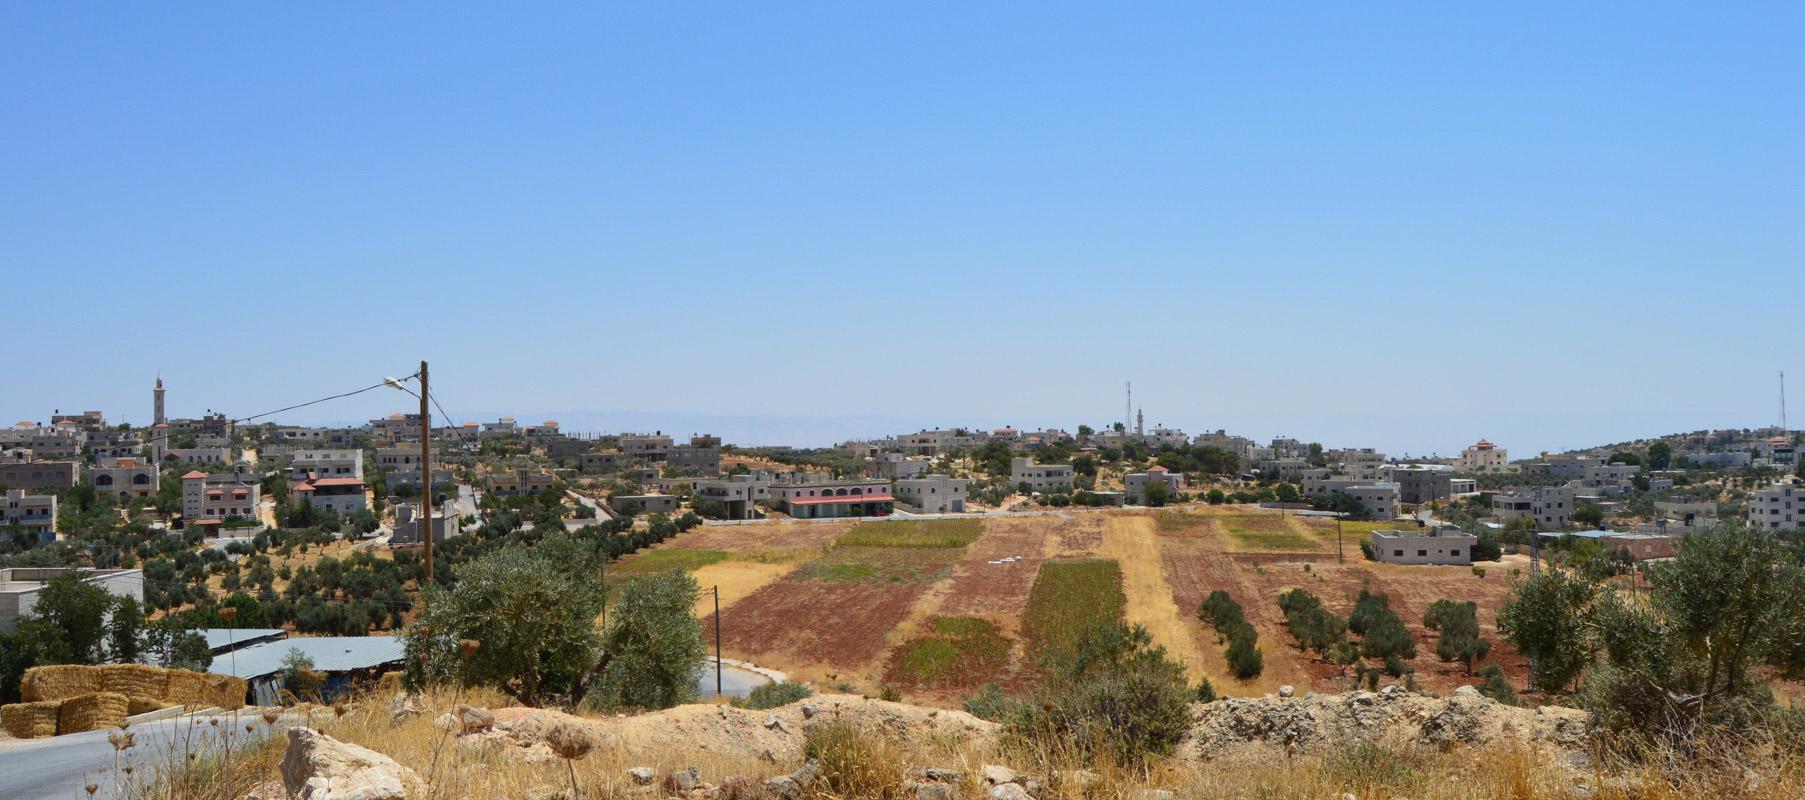 Duma, palestine